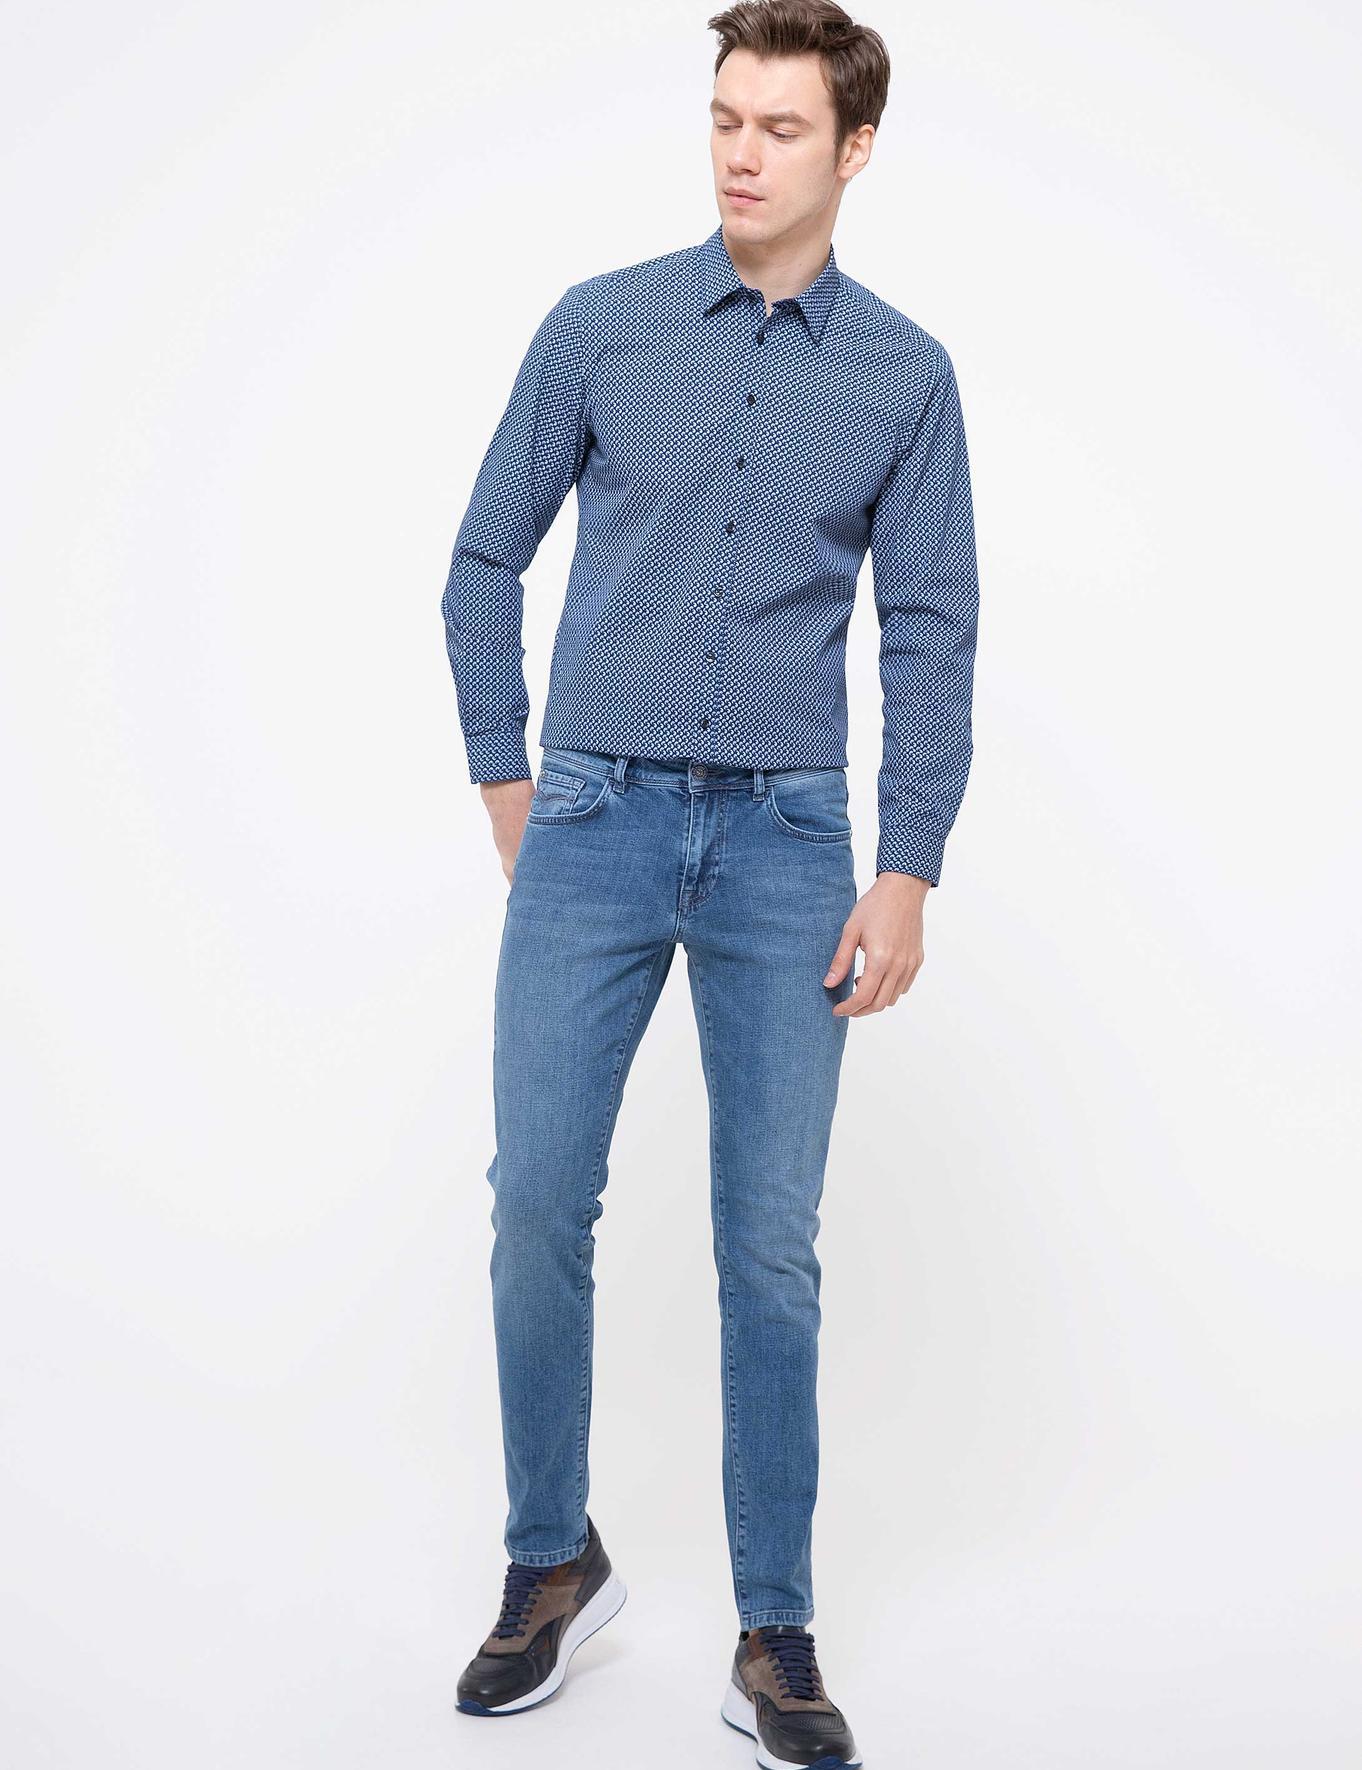 Lacivert Slim Fit Gömlek - 50201657005